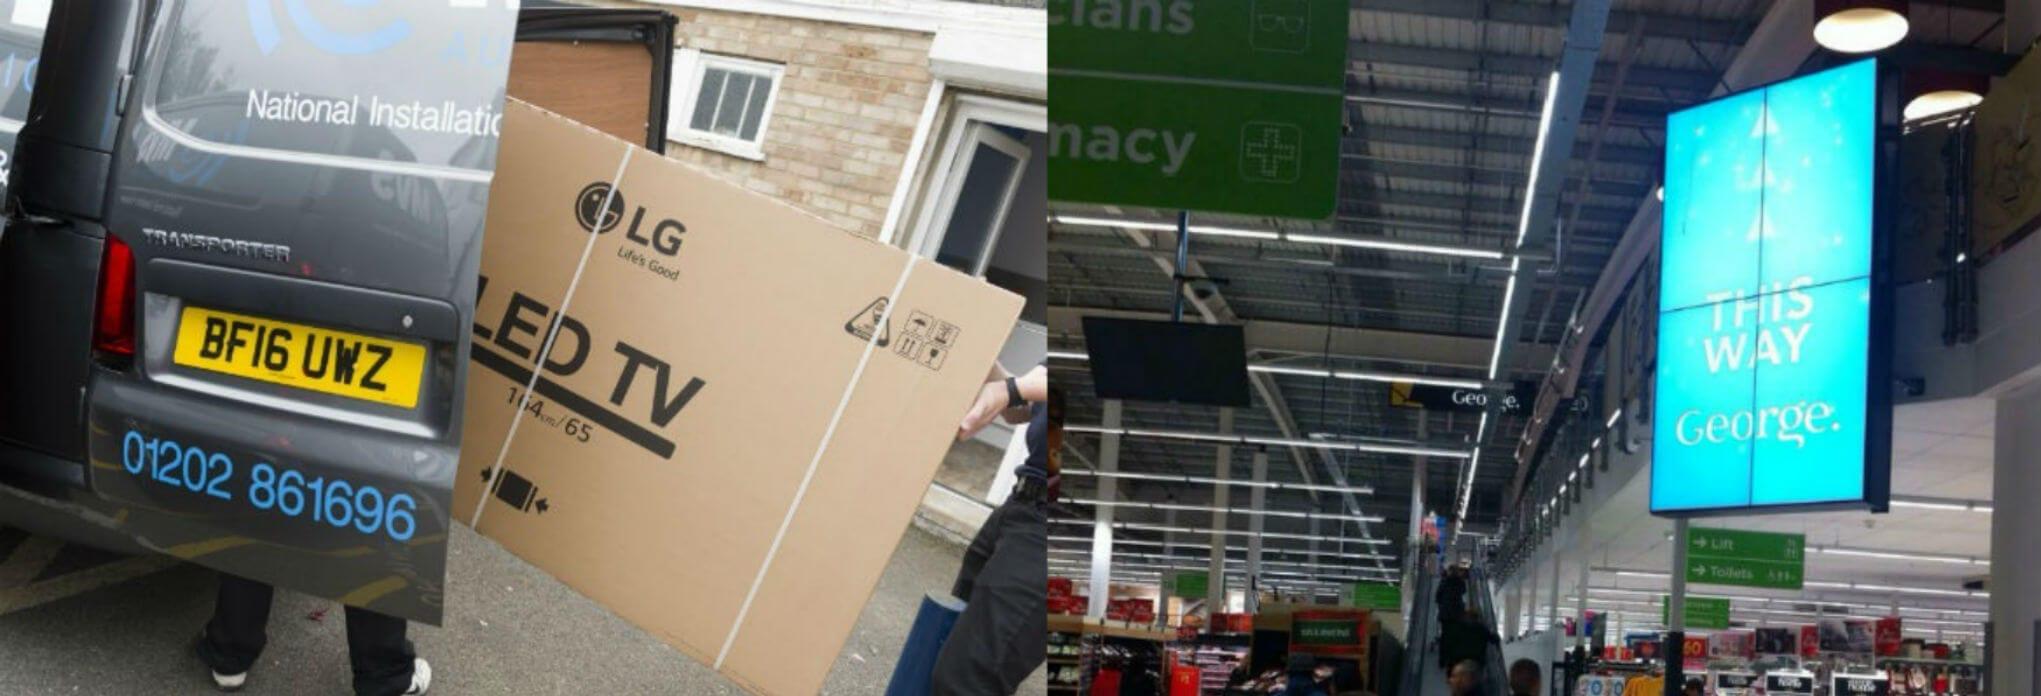 commercial displays vs consumer tvs